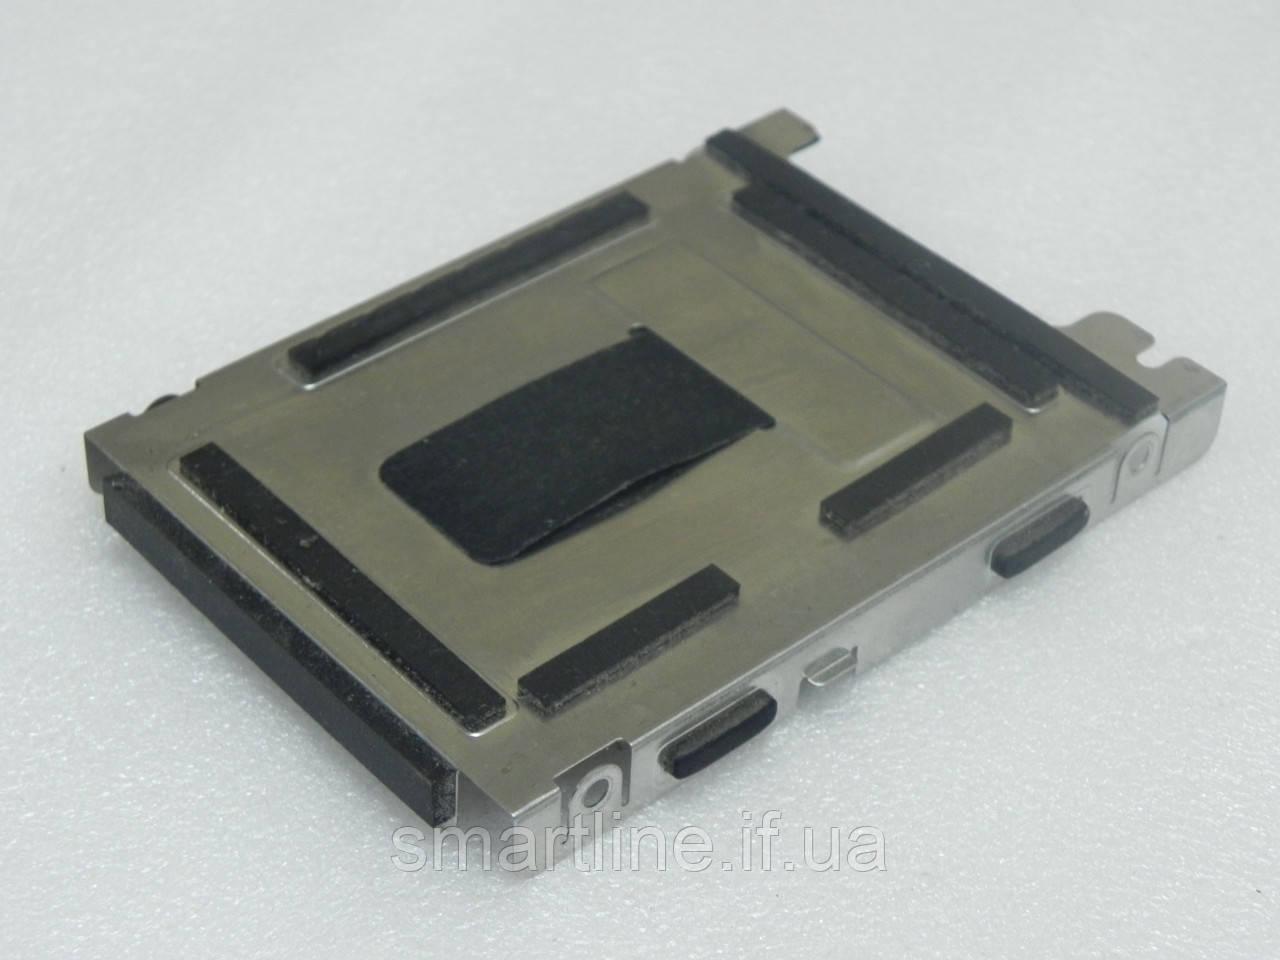 Шахта HDD для ноутбука Asus x50n, x50gl б/в